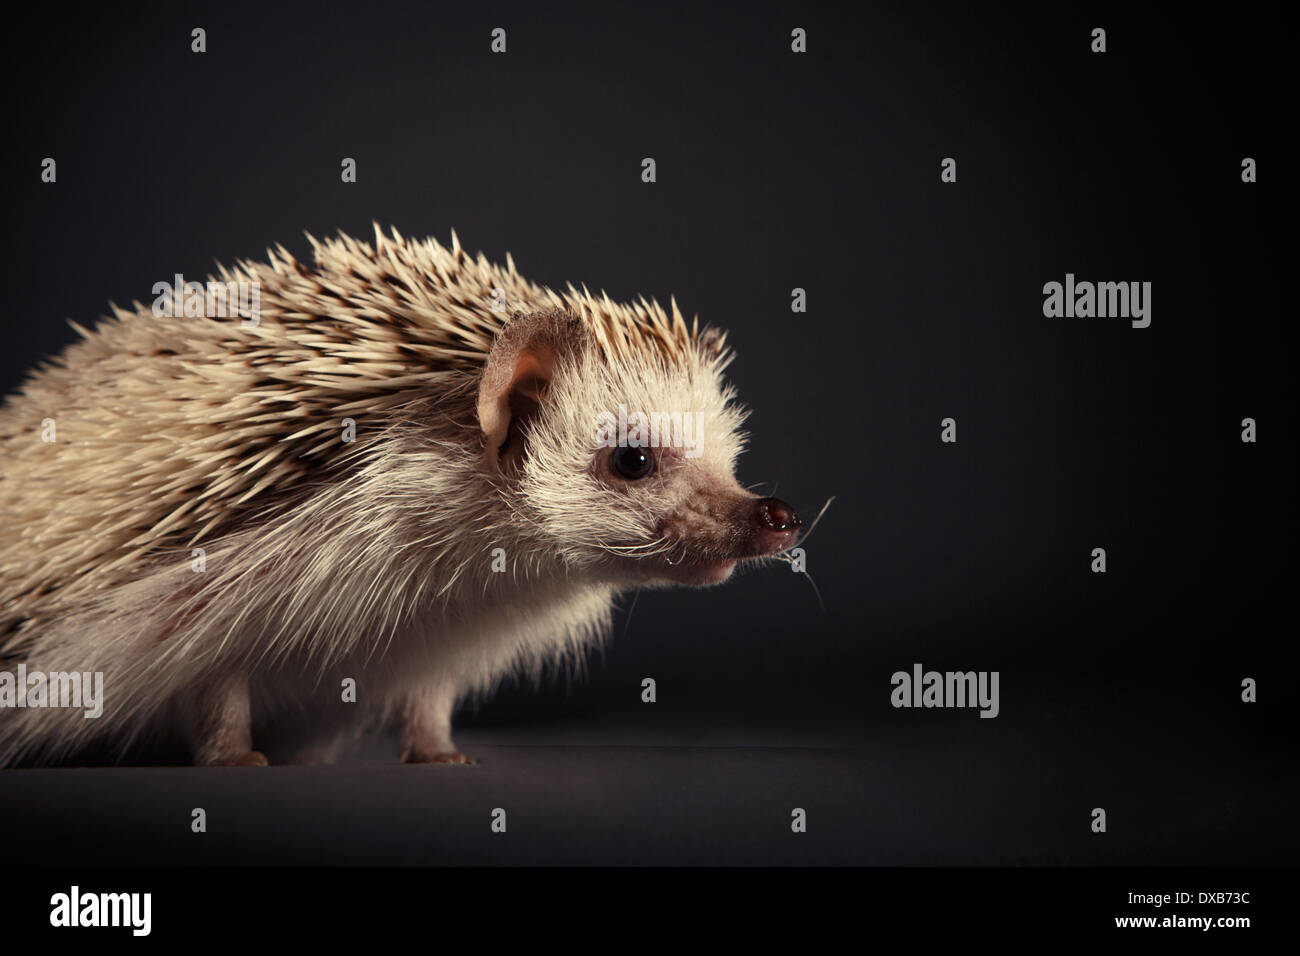 Studio portrait of a hedgehog on a black background. - Stock Image